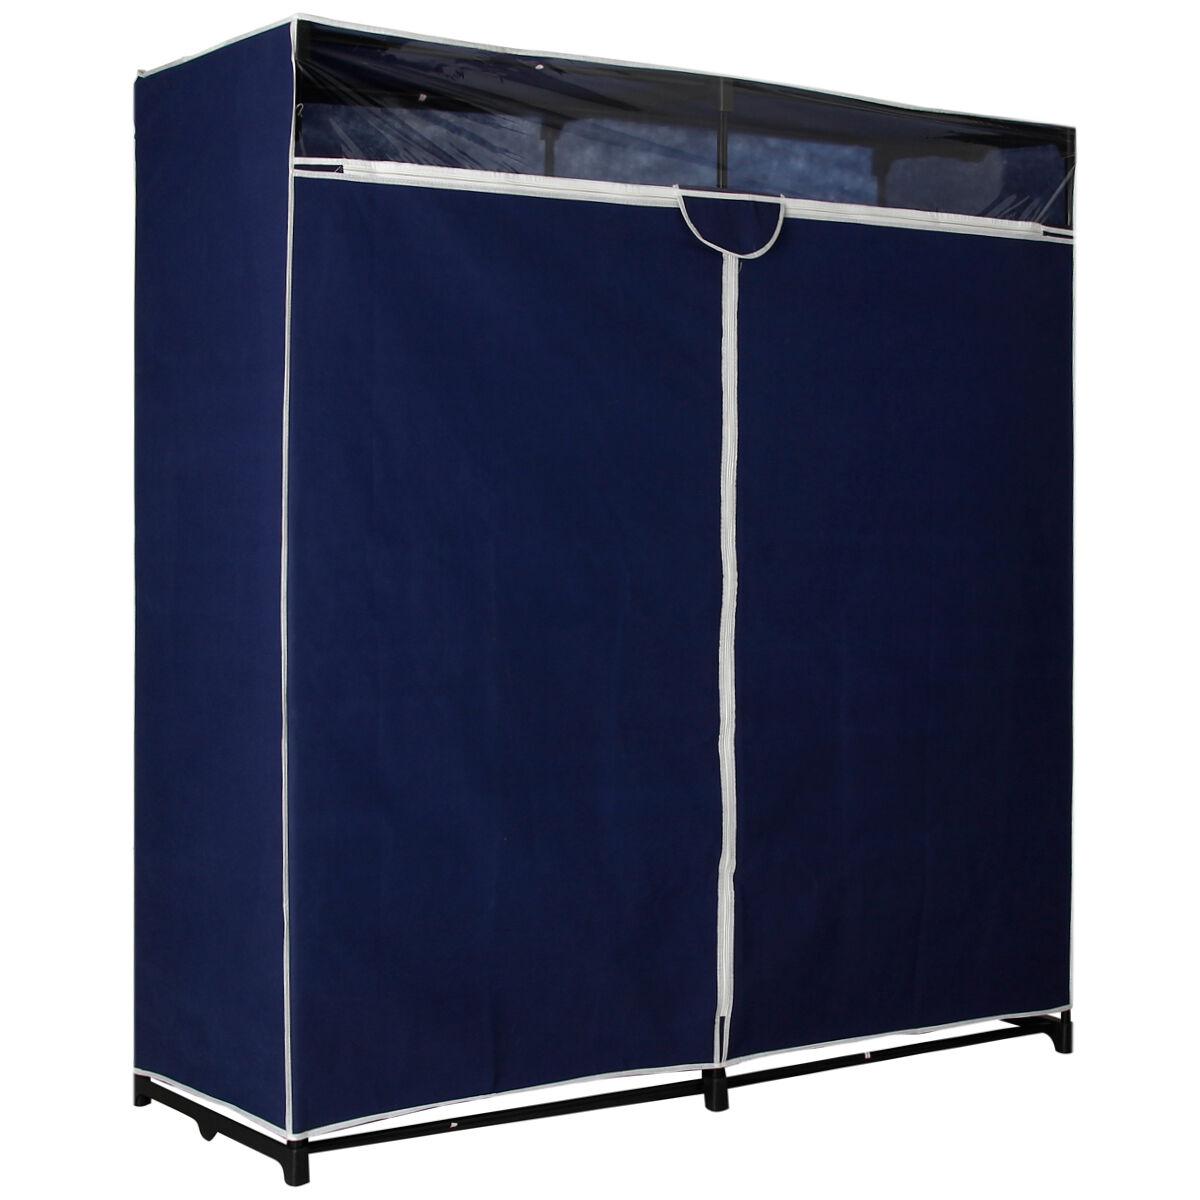 Large Portable Closet : Wardrobe closet storage